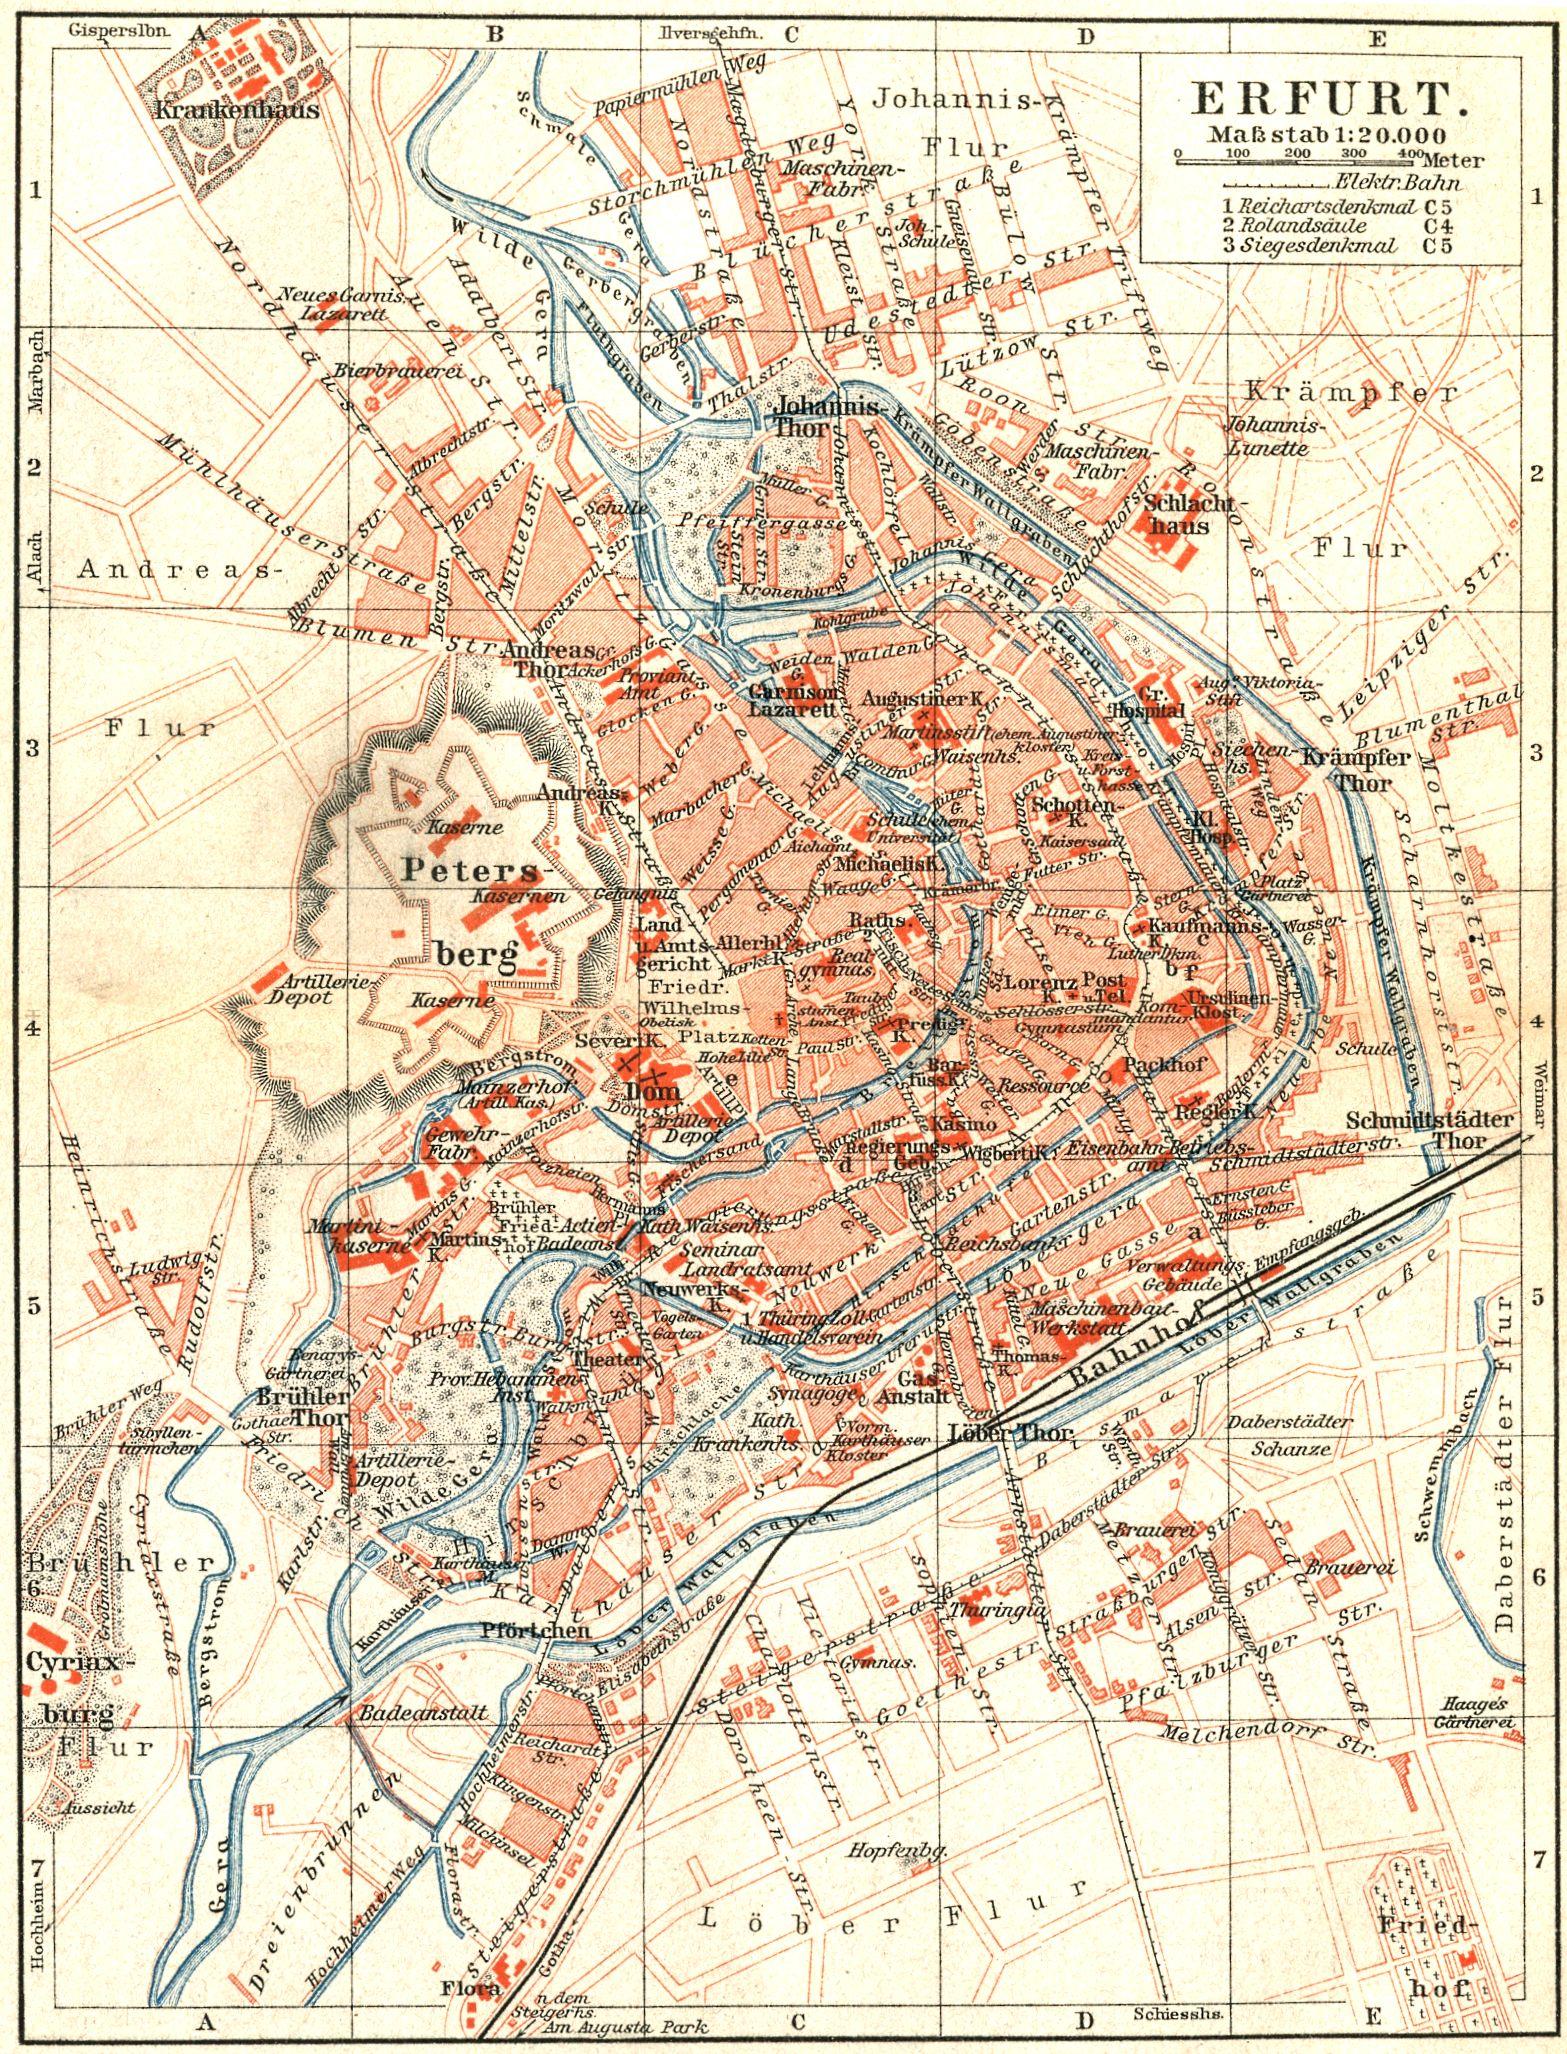 FileErfurt Map 1894jpg Wikimedia Commons